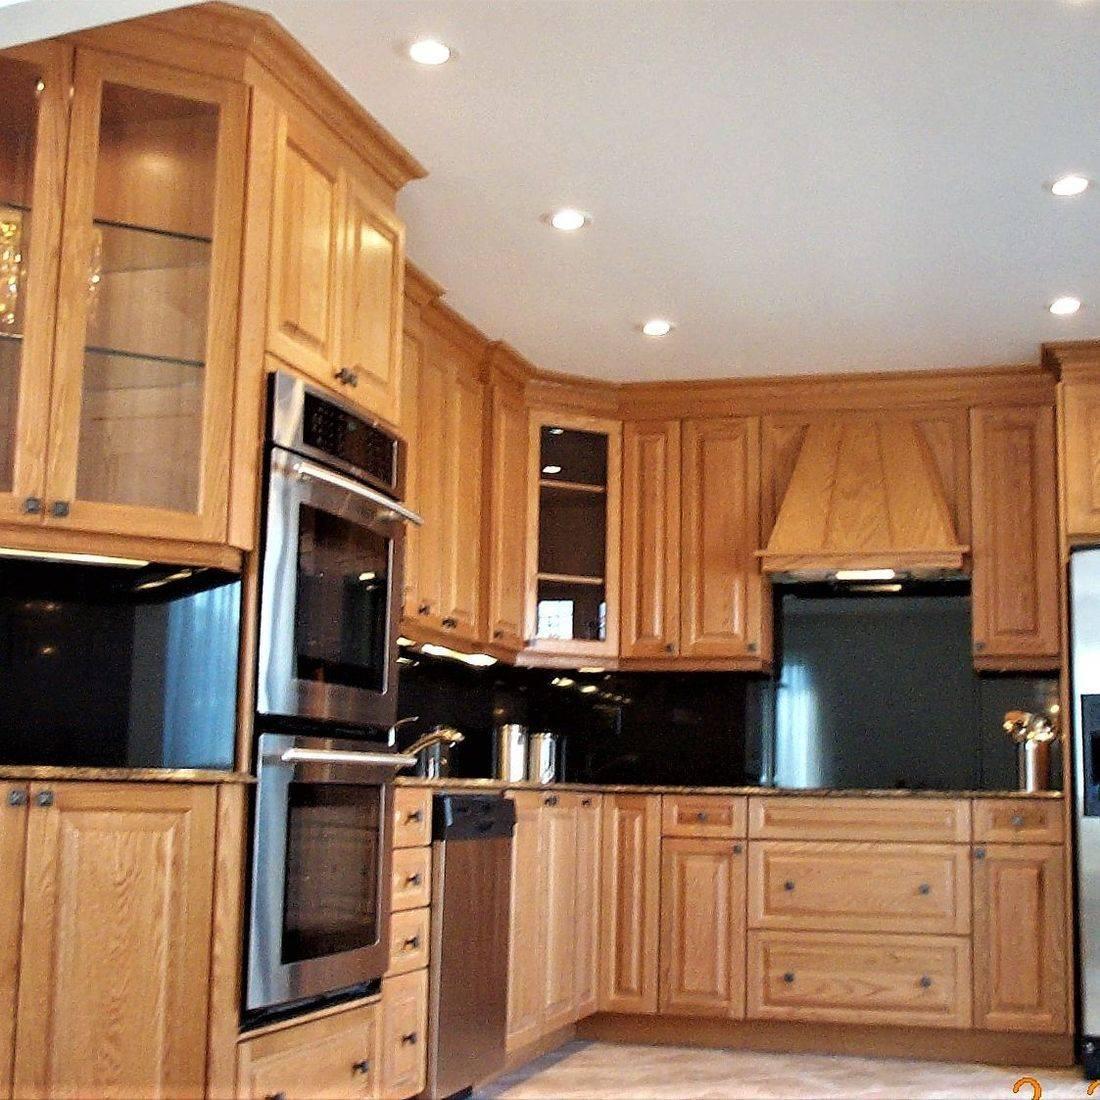 Sibra Kitchens Markham Toronto oak cabinets